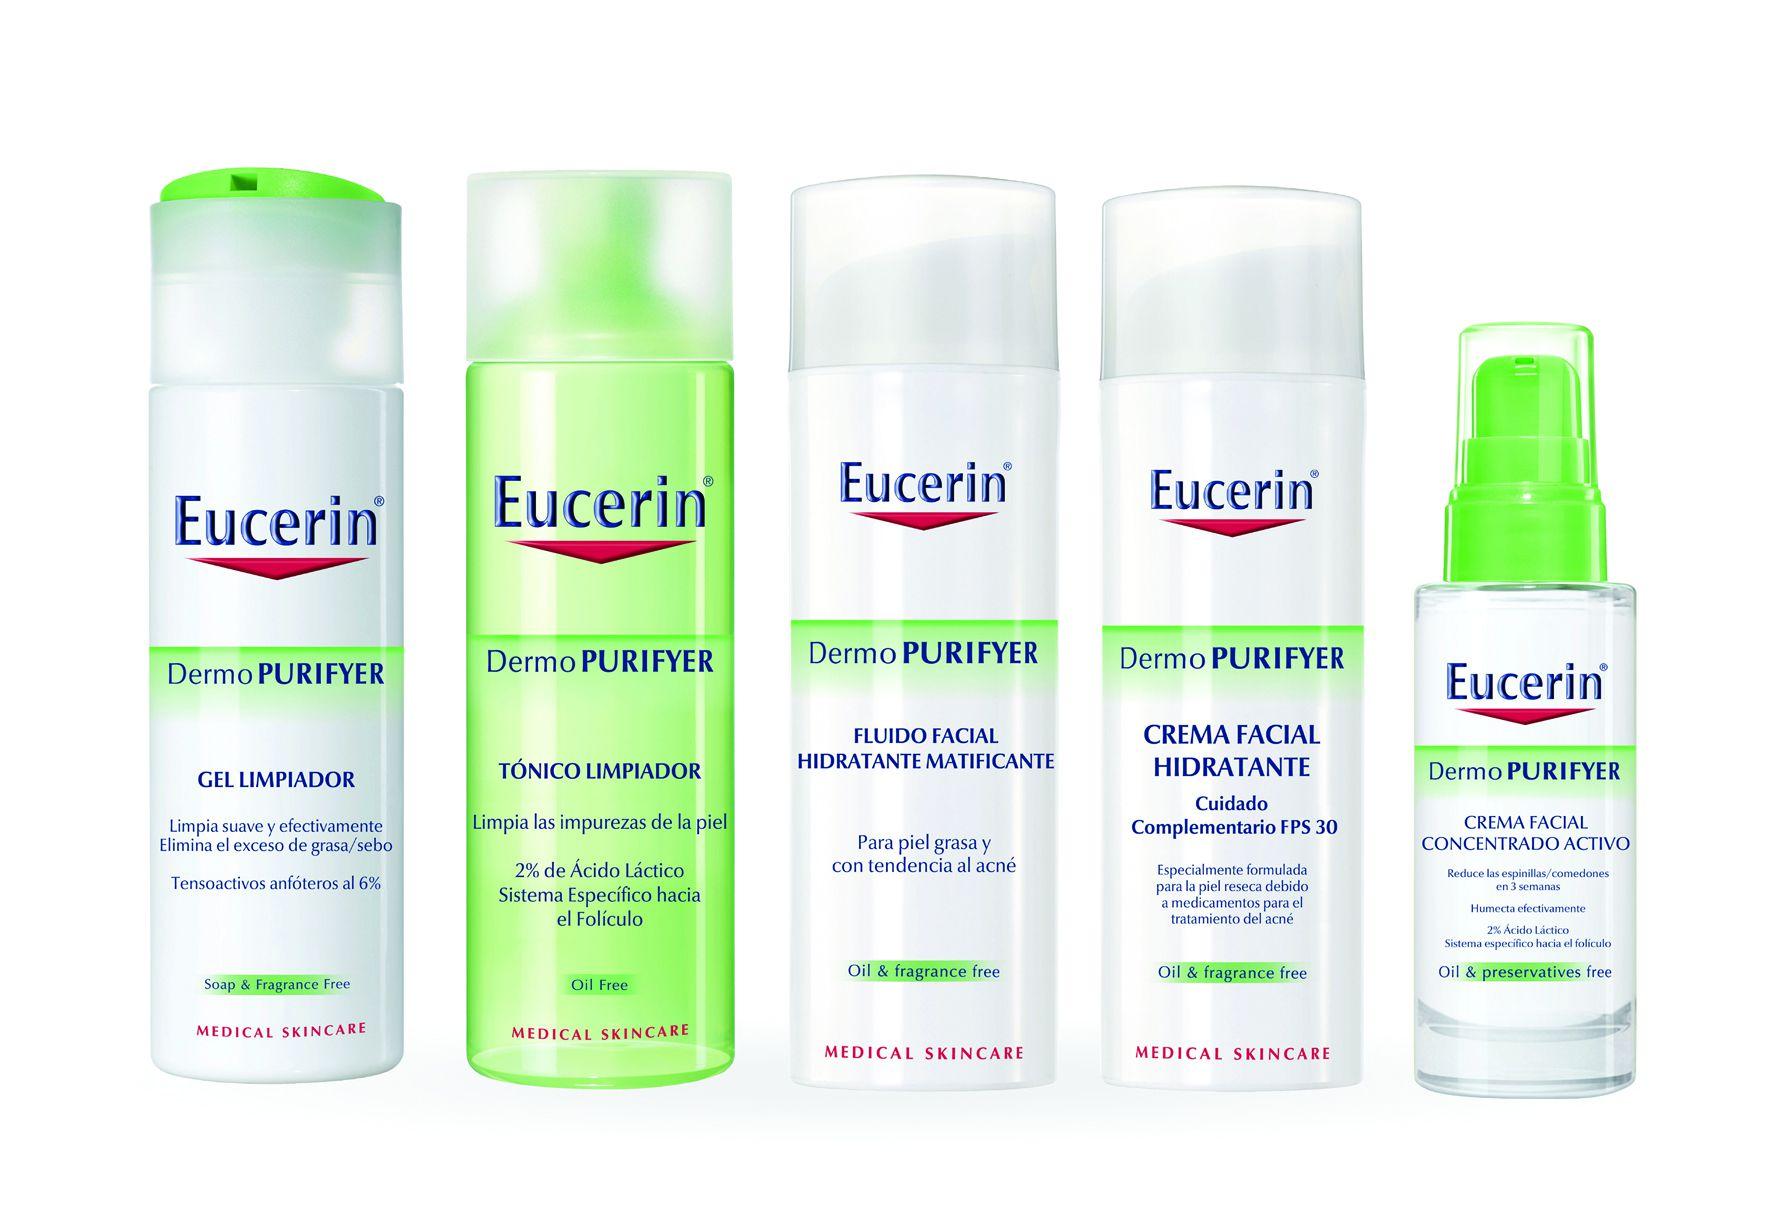 eucerin 3